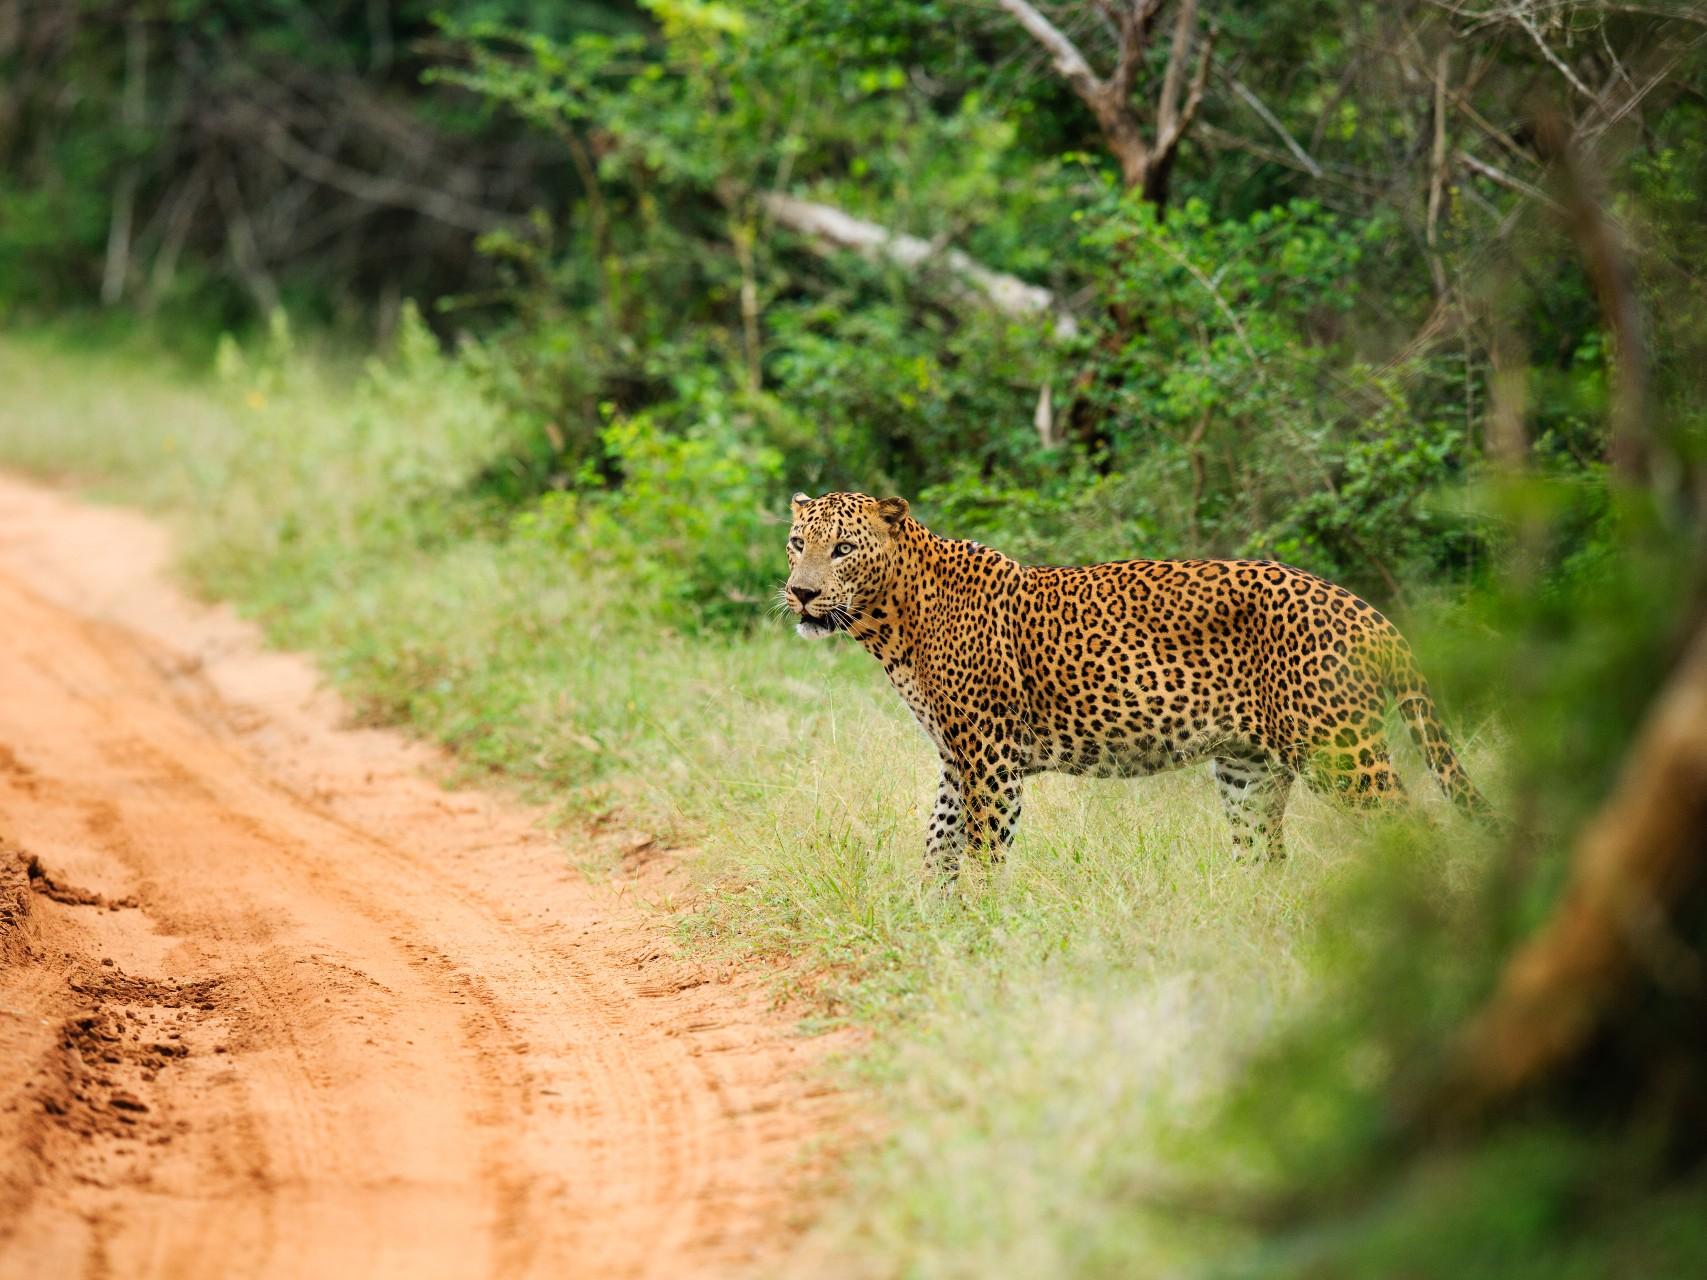 Wildlife at Yala National Park, Sri Lanka